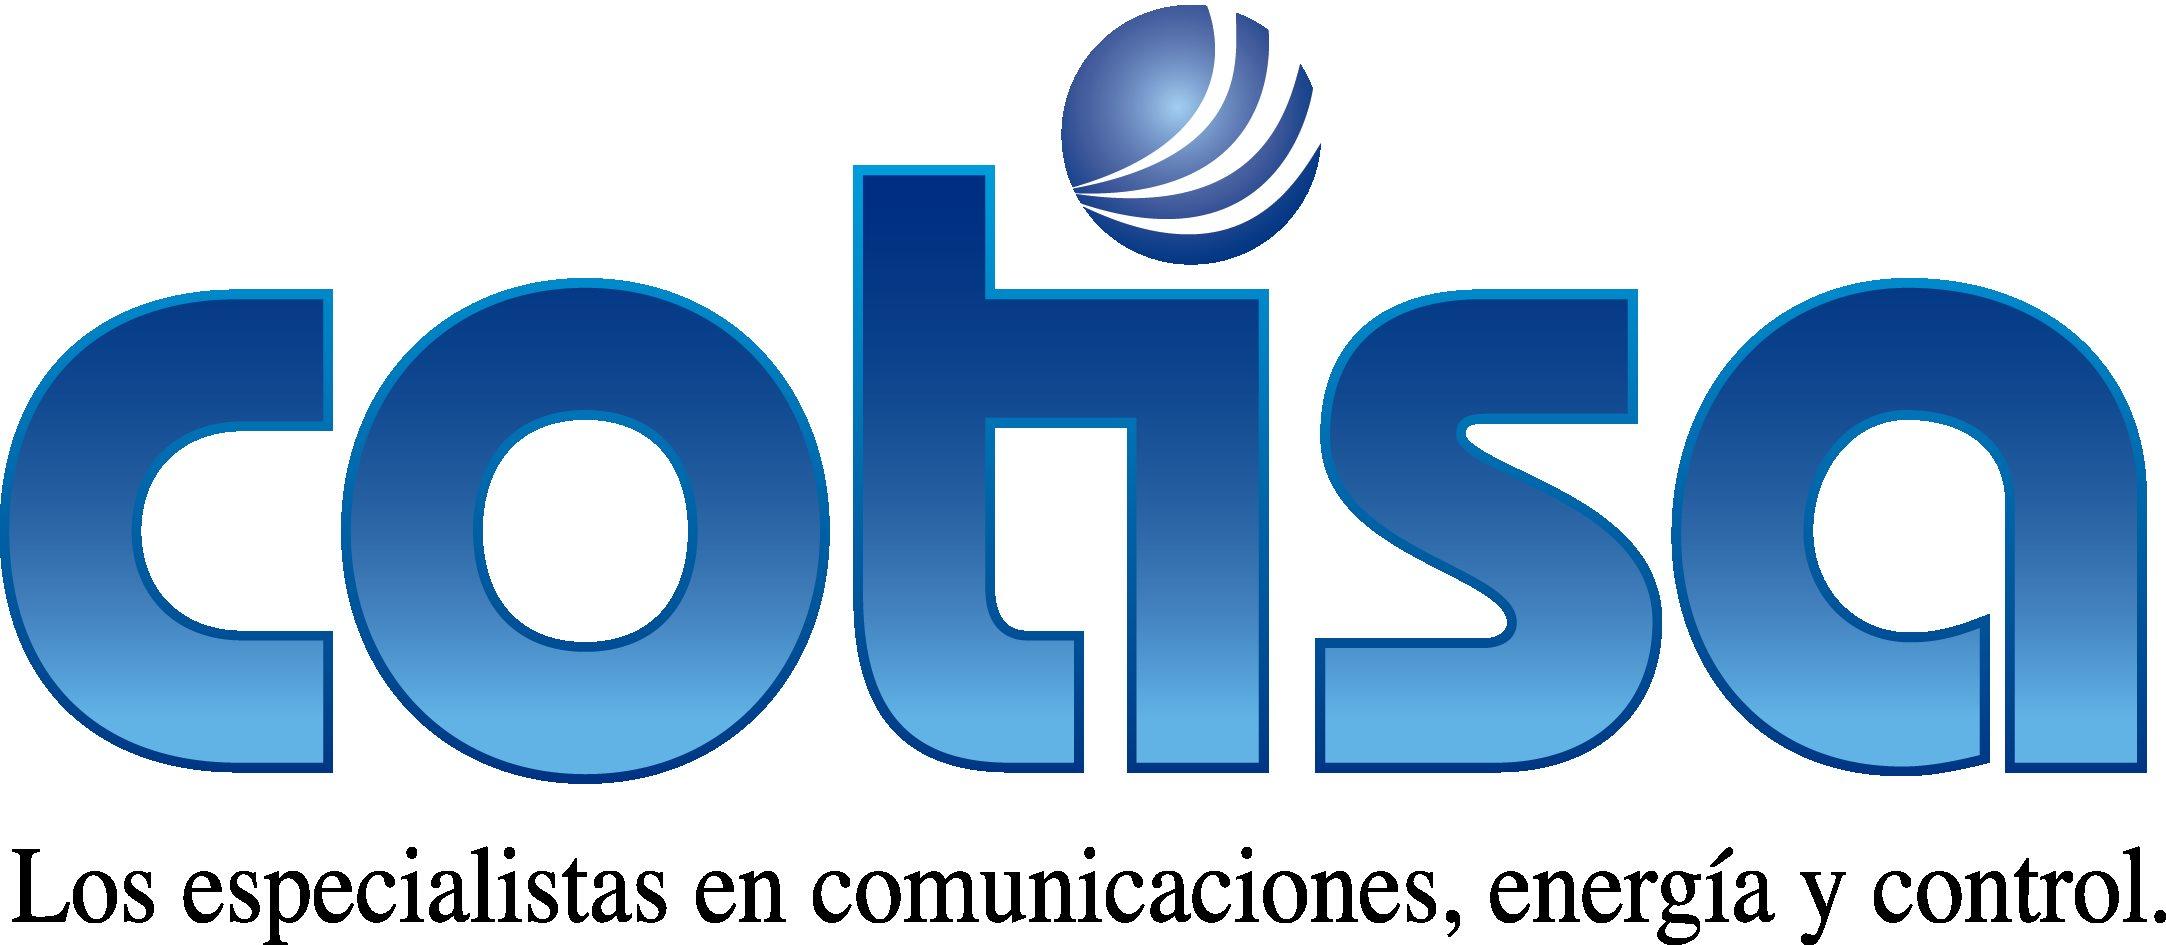 Comercial Técnica Internacional Cotisa, S.A.